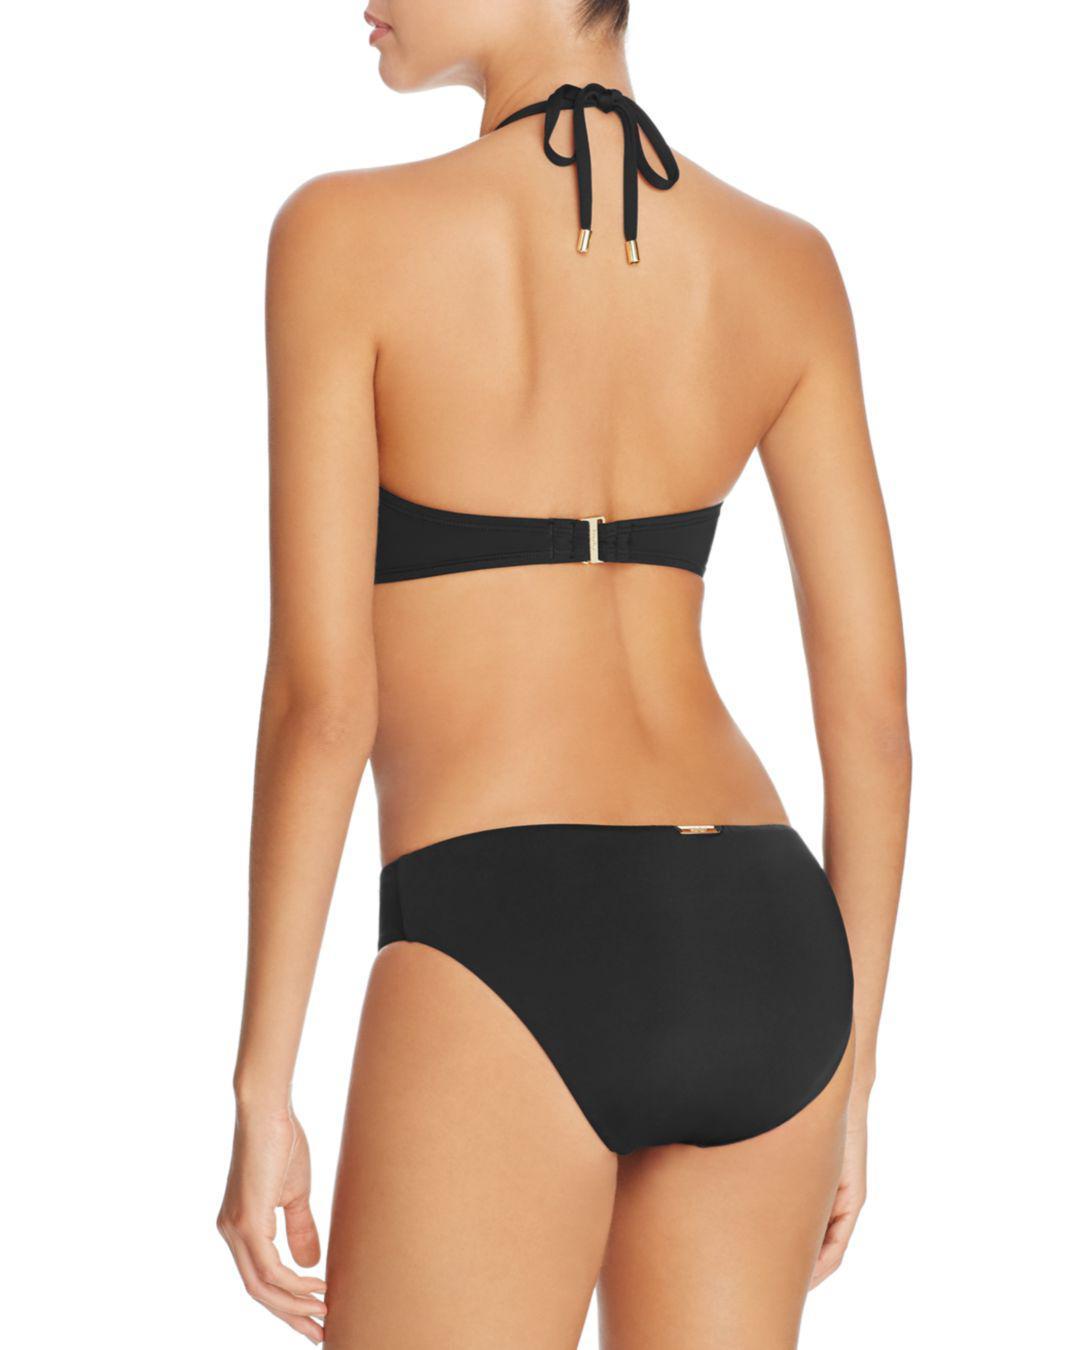 154106fbfa Lyst - Laundry By Shelli Segal Hipster Bikini Bottom in Black - Save  34.14634146341463%